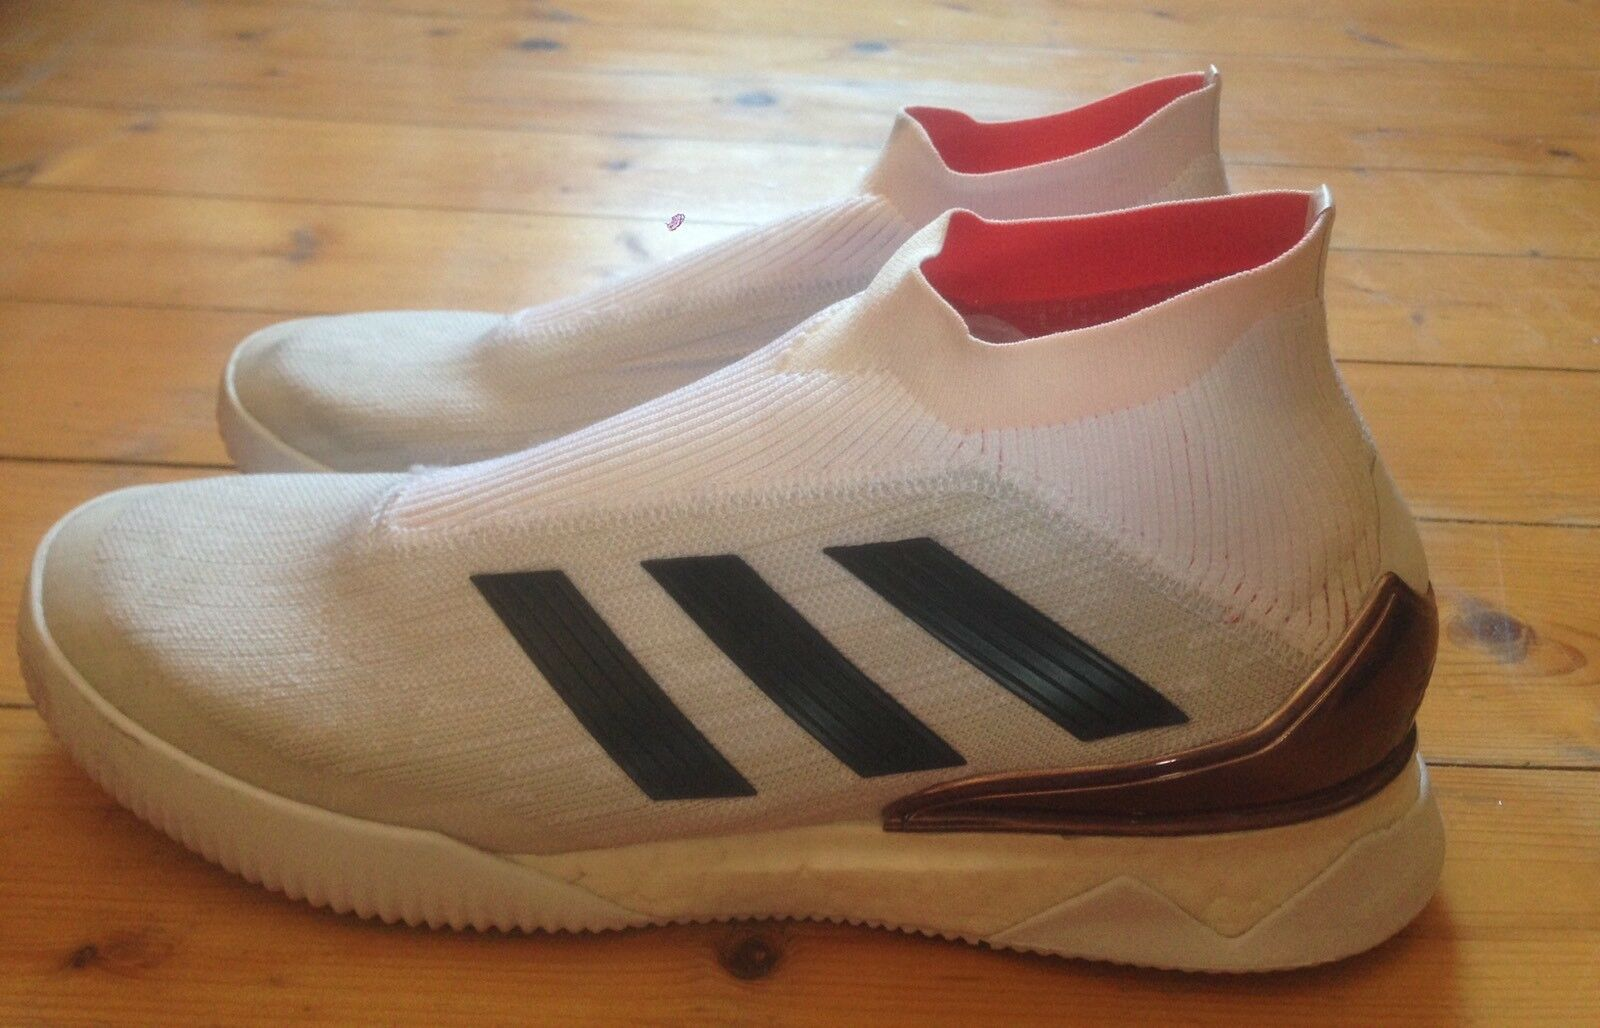 Adidas Protator Tango 18+  Gr.42 2 3